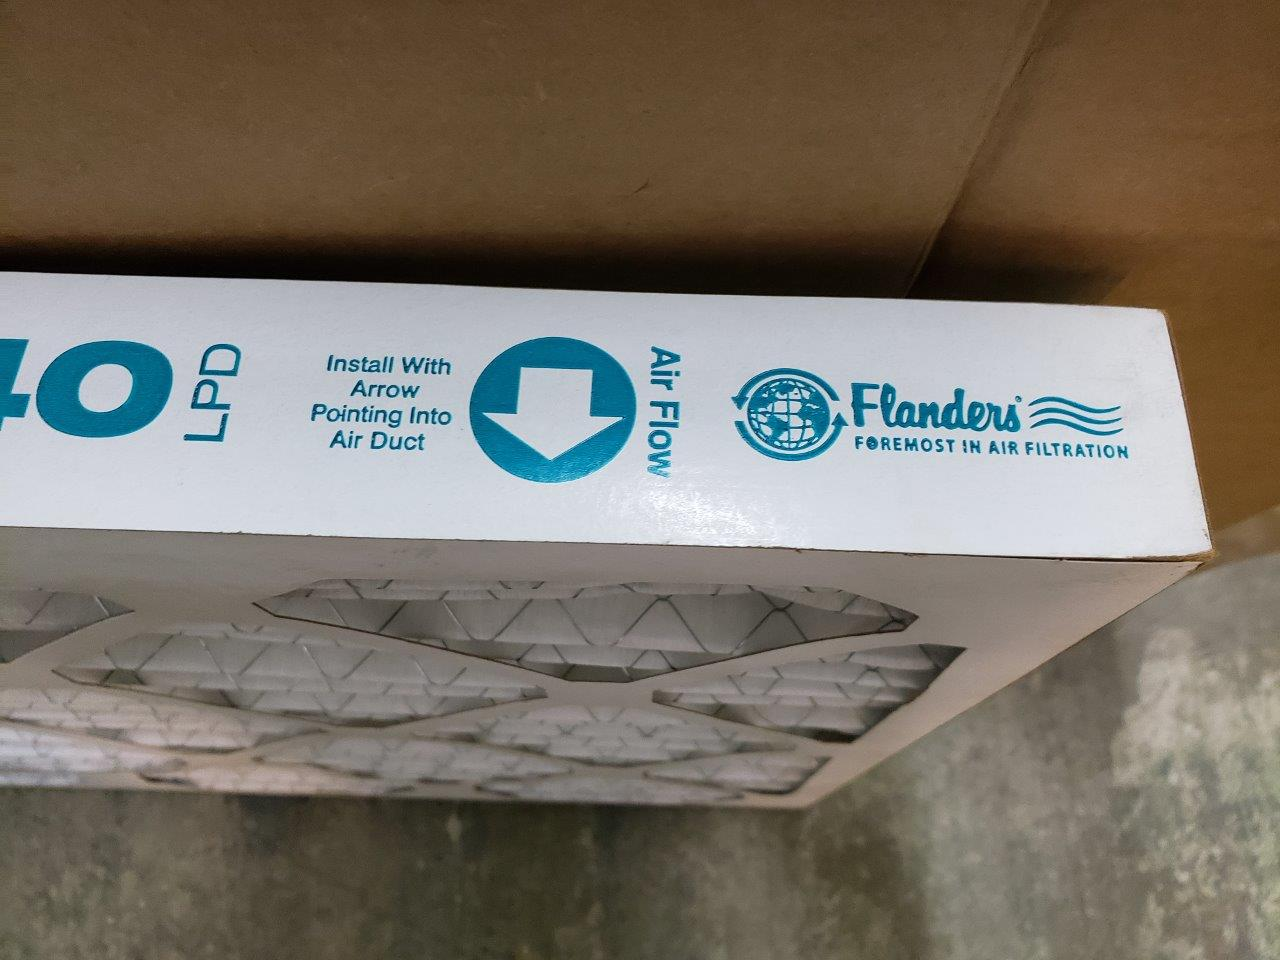 16x20x2 Furnace Air Filter Flanders MERV 8 Prepleat 40 LPD AC